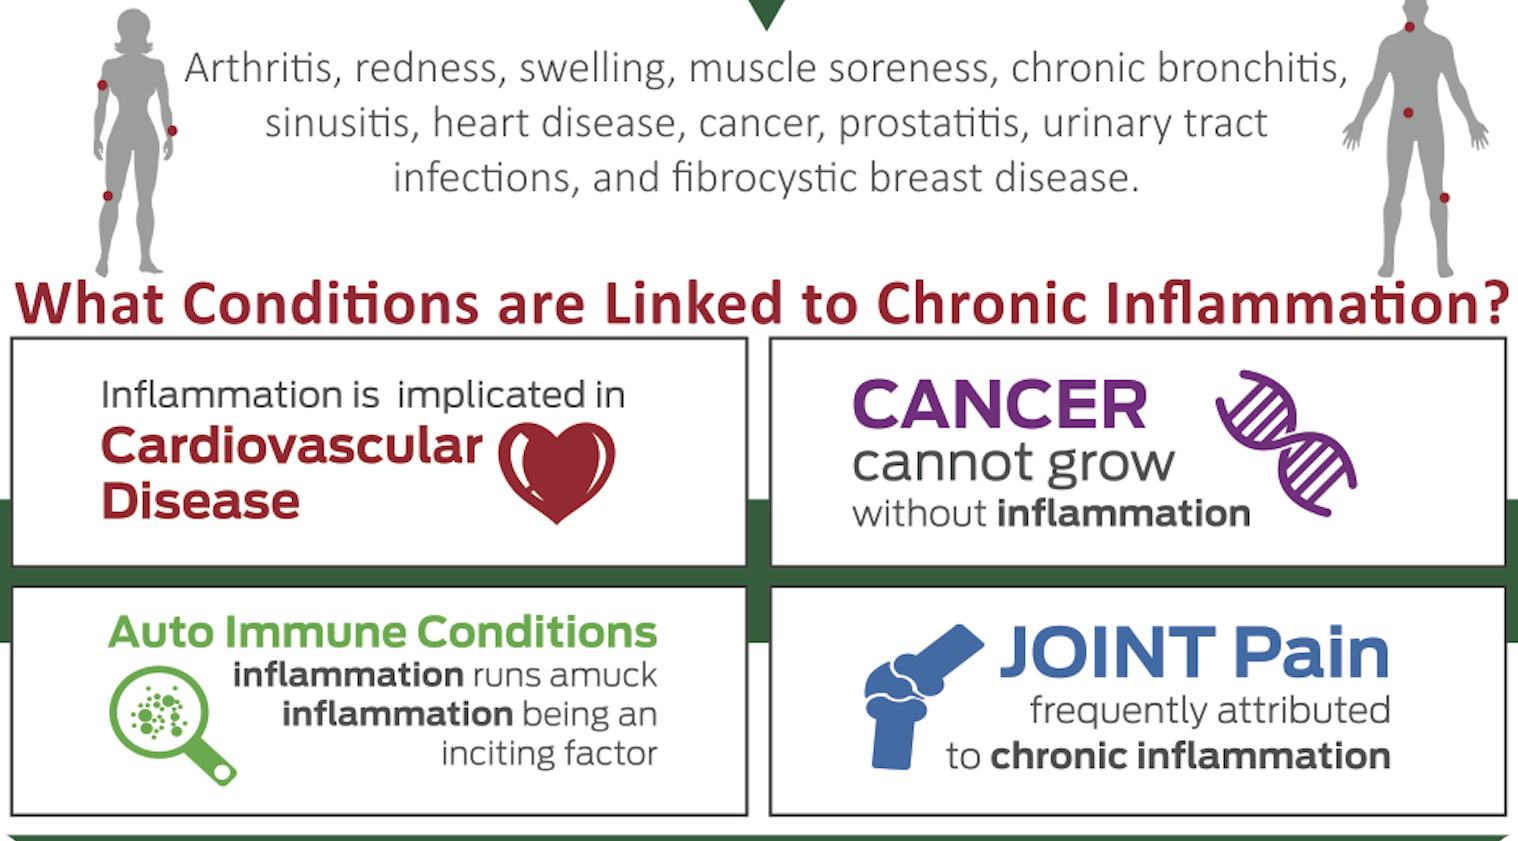 6 Warning Signs You Have Chronic Inflammation - Medicalopedia